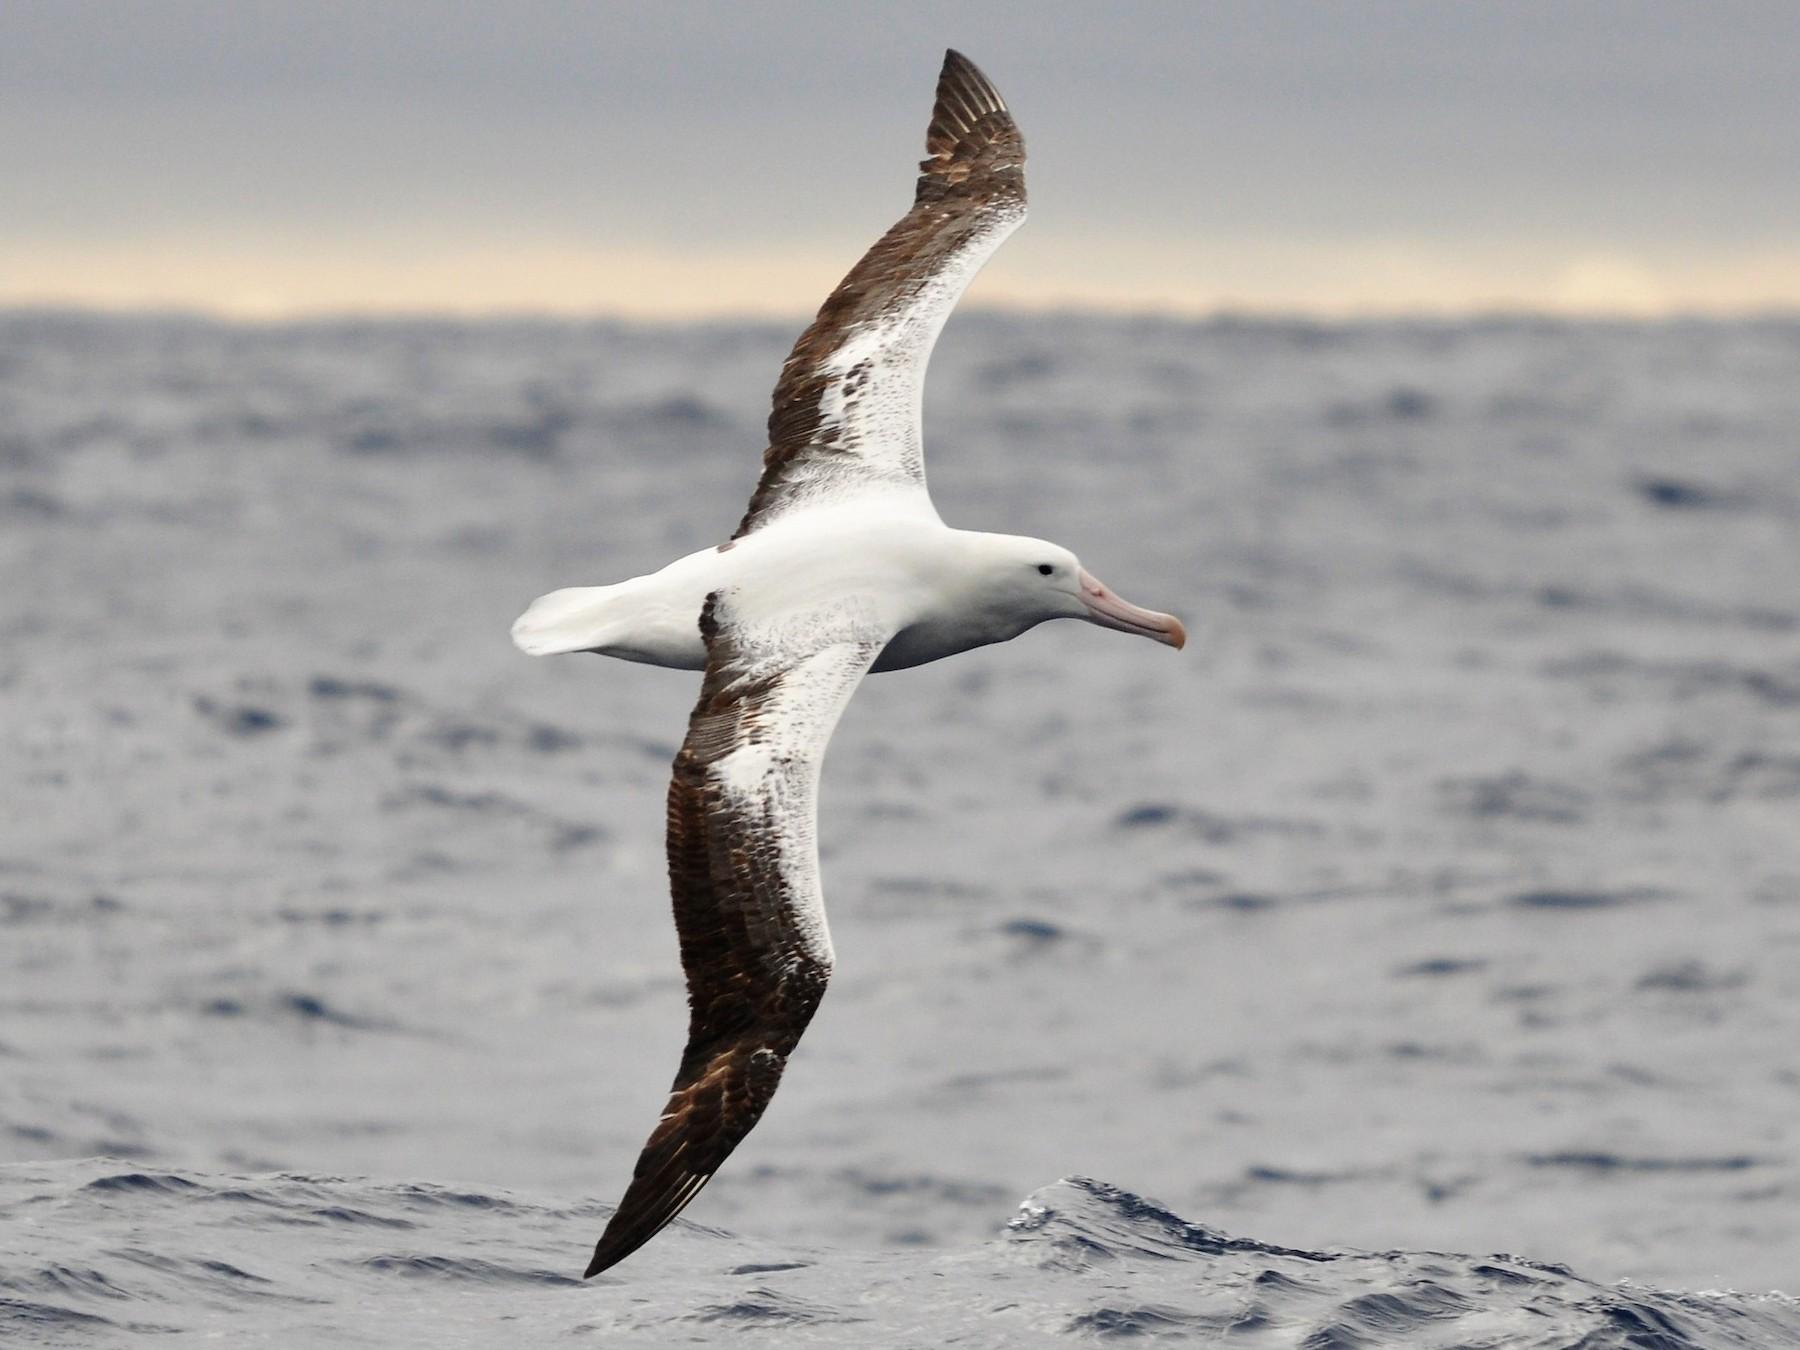 Royal Albatross - Heidi Krajewsky